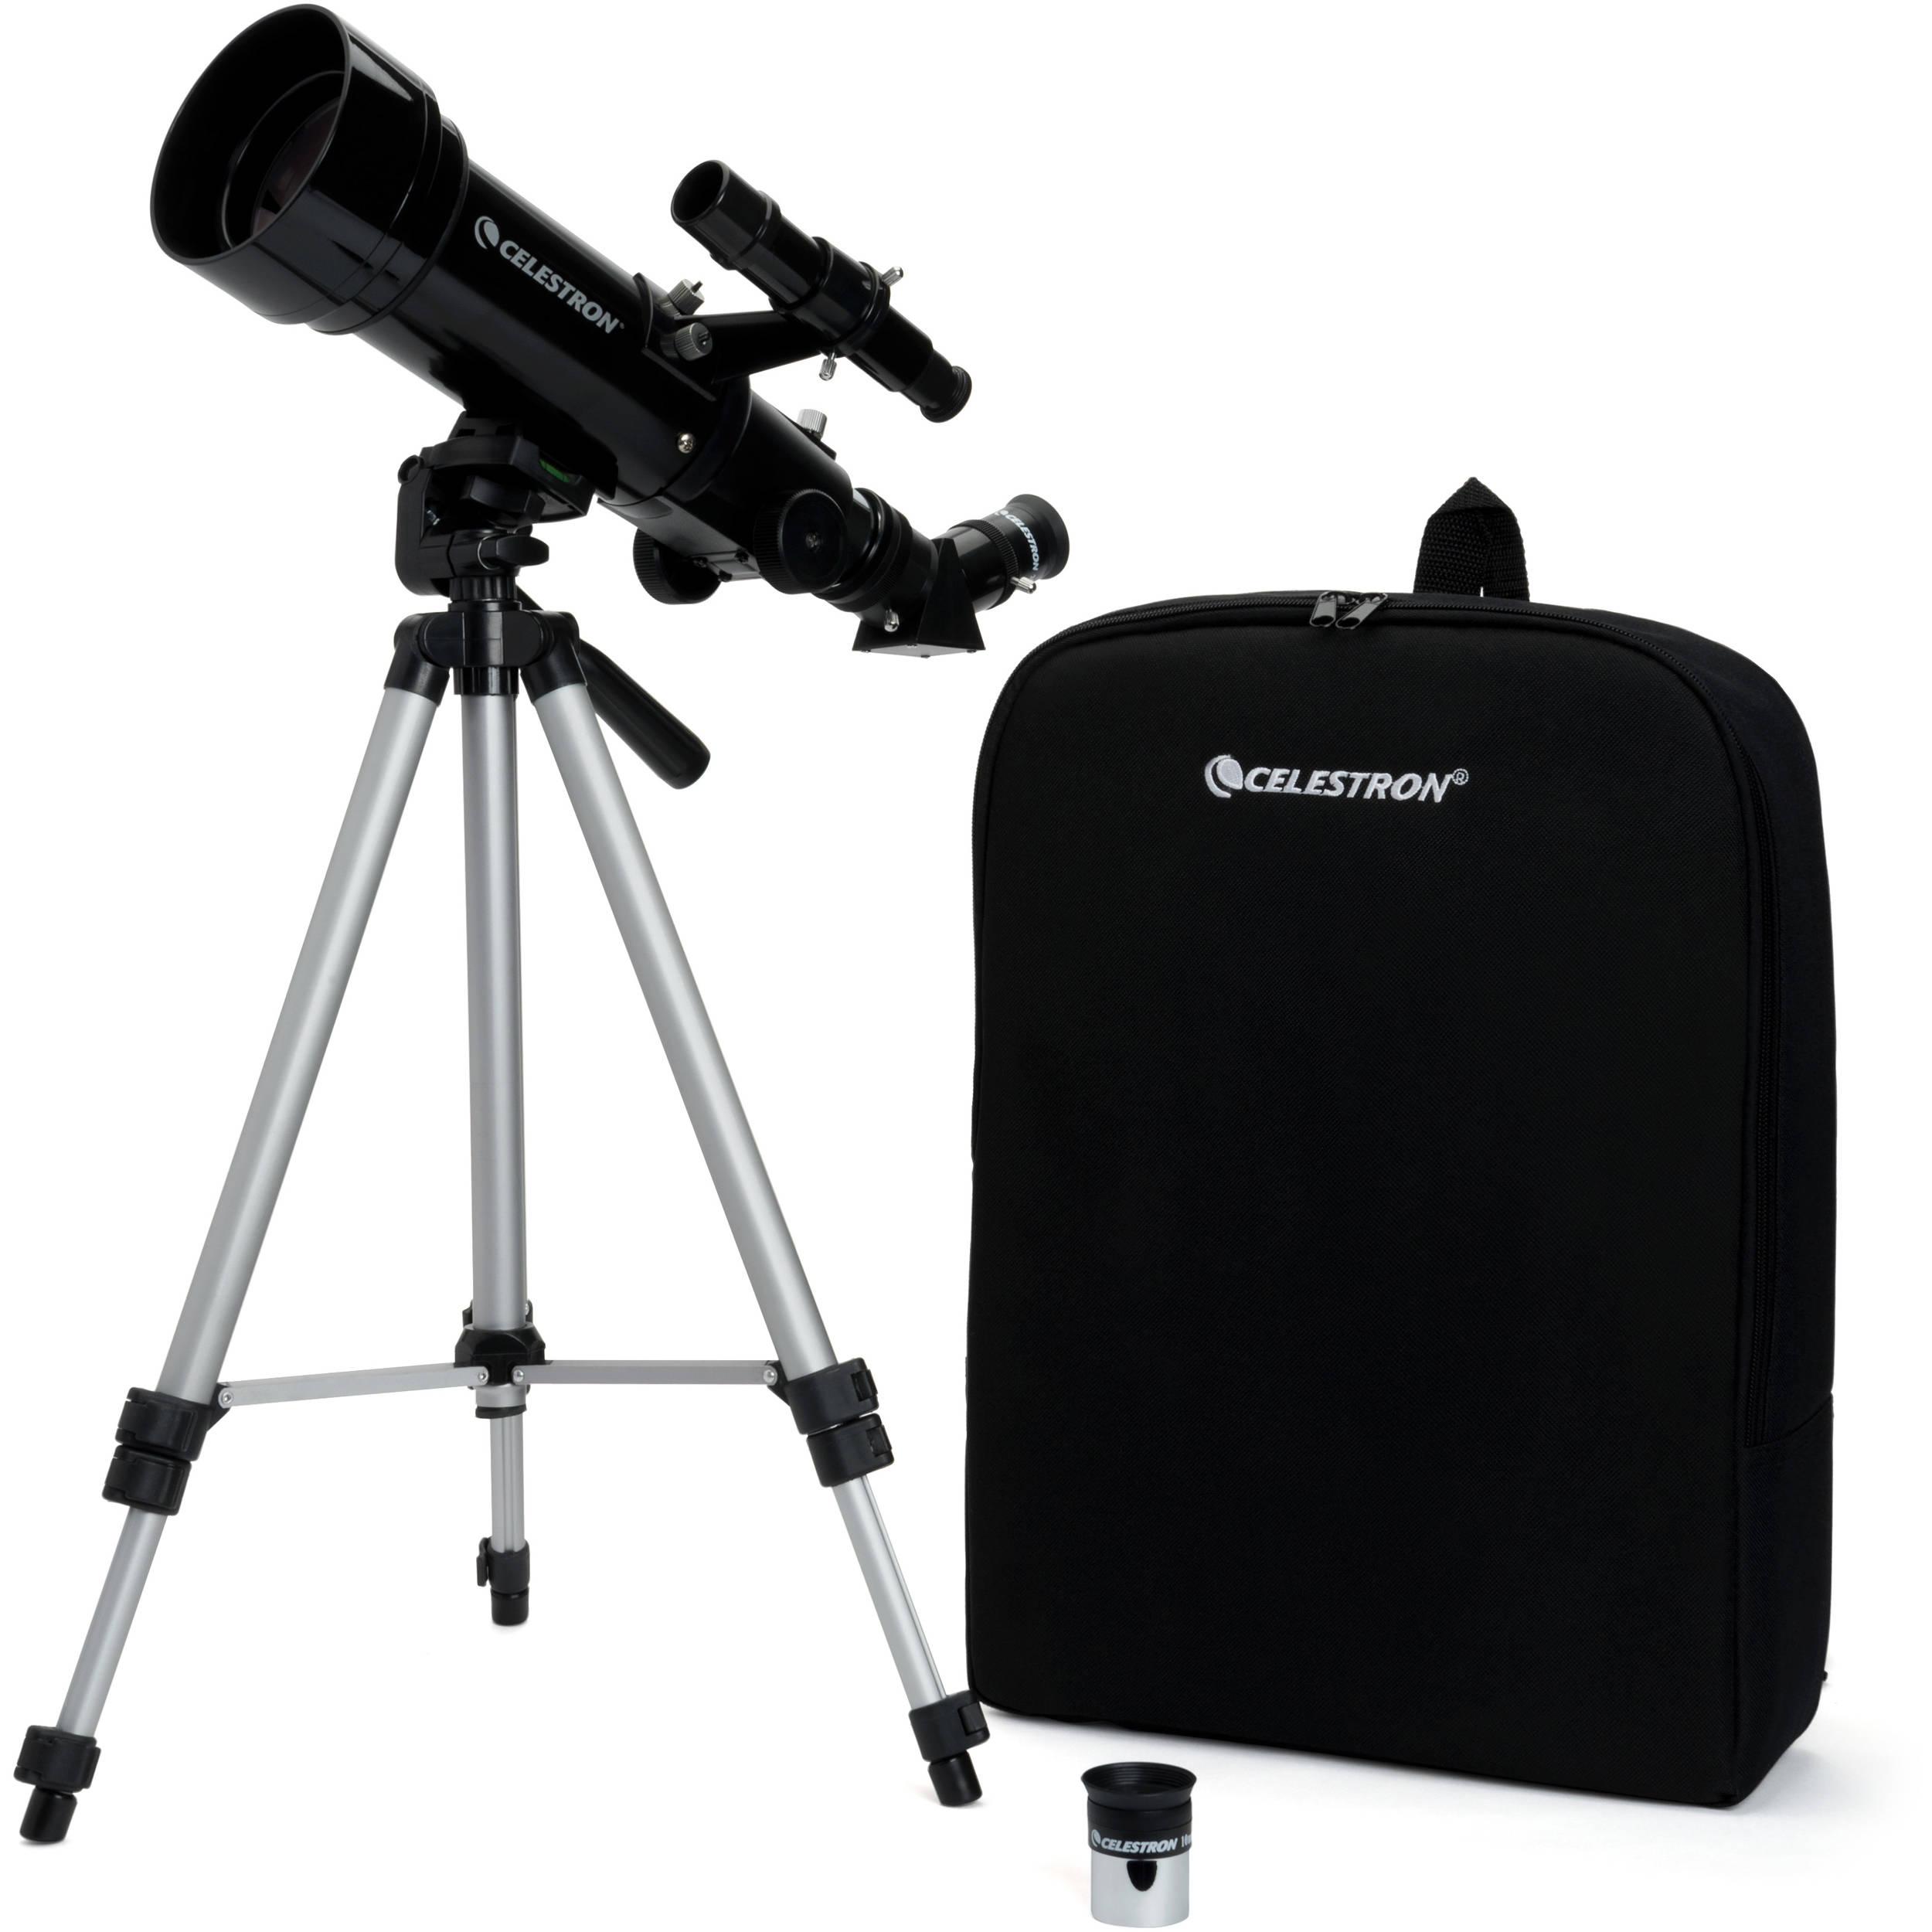 celestron travel scope 70mm f 5 7 az refractor telescope 21035. Black Bedroom Furniture Sets. Home Design Ideas